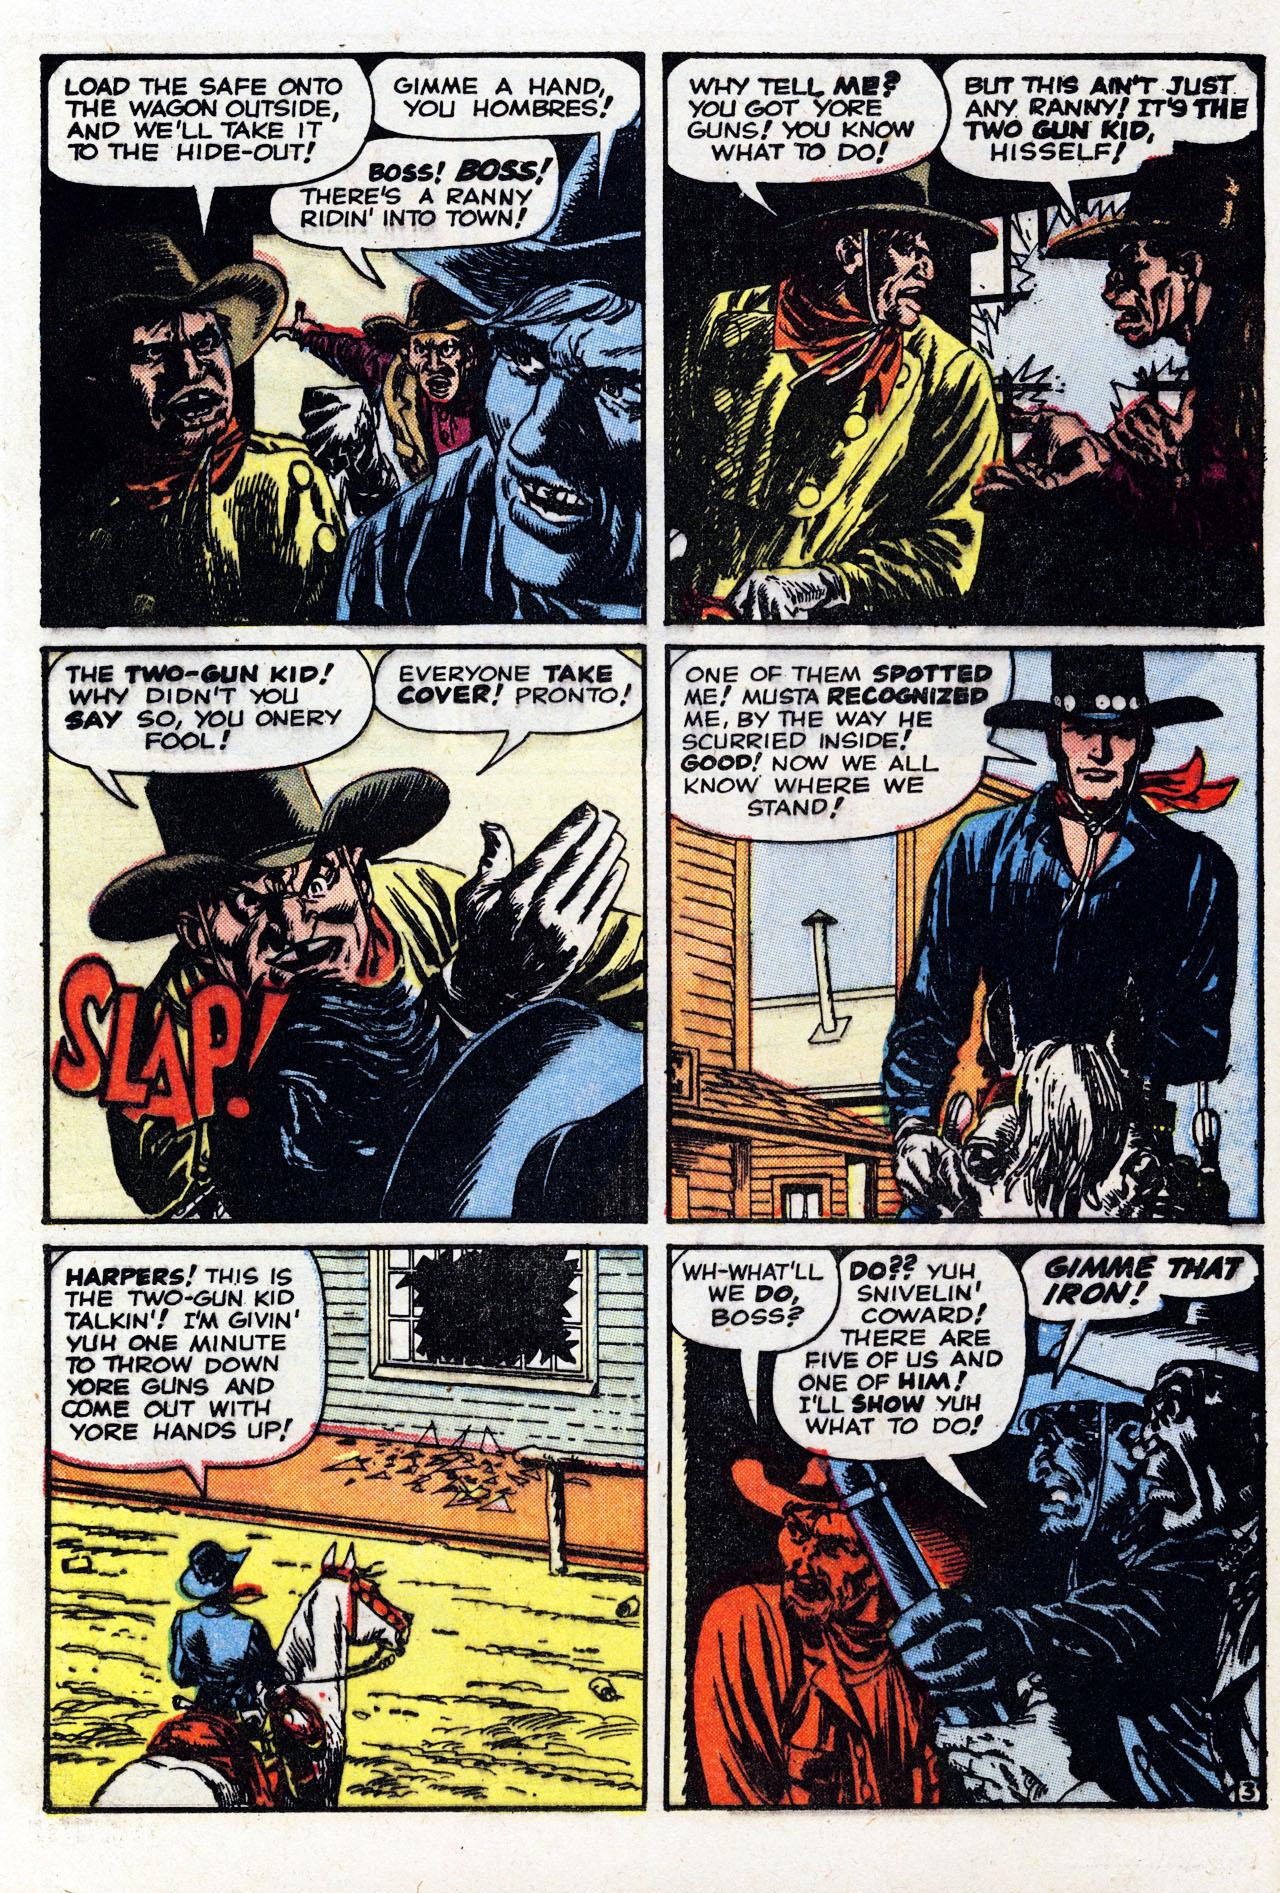 Read online Two-Gun Kid comic -  Issue #53 - 12